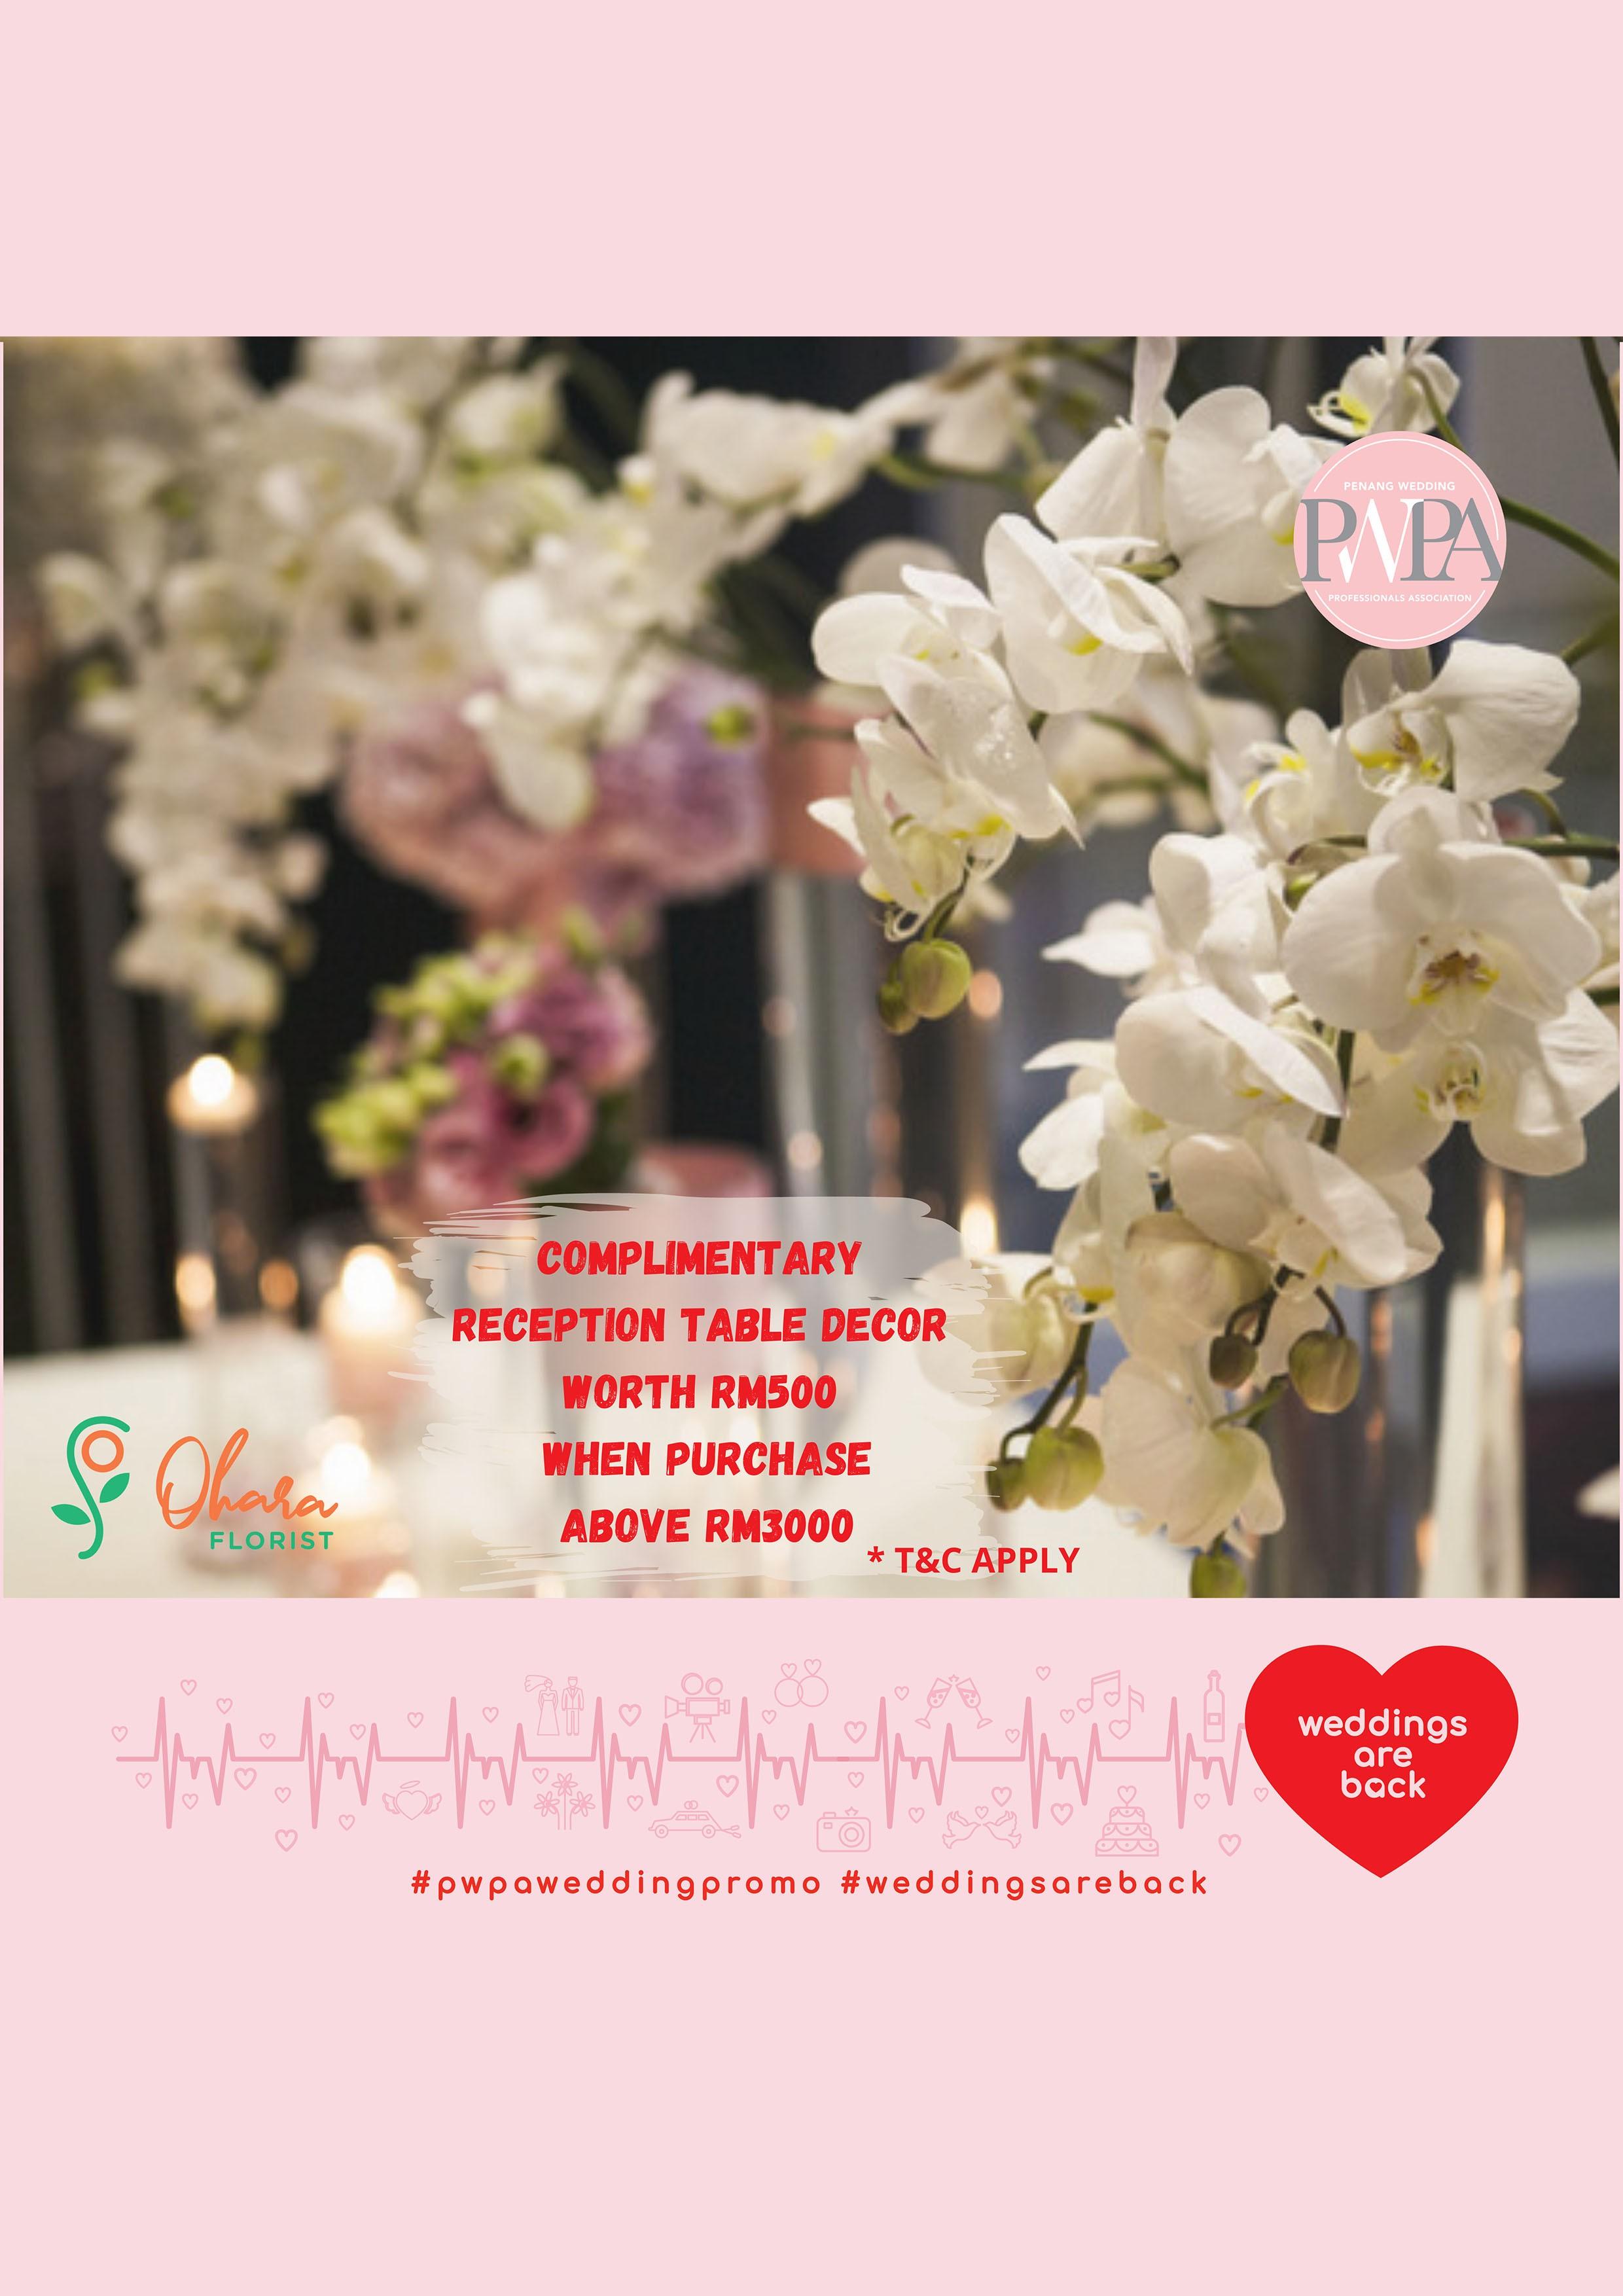 Ohara Florist Sdn Bhd